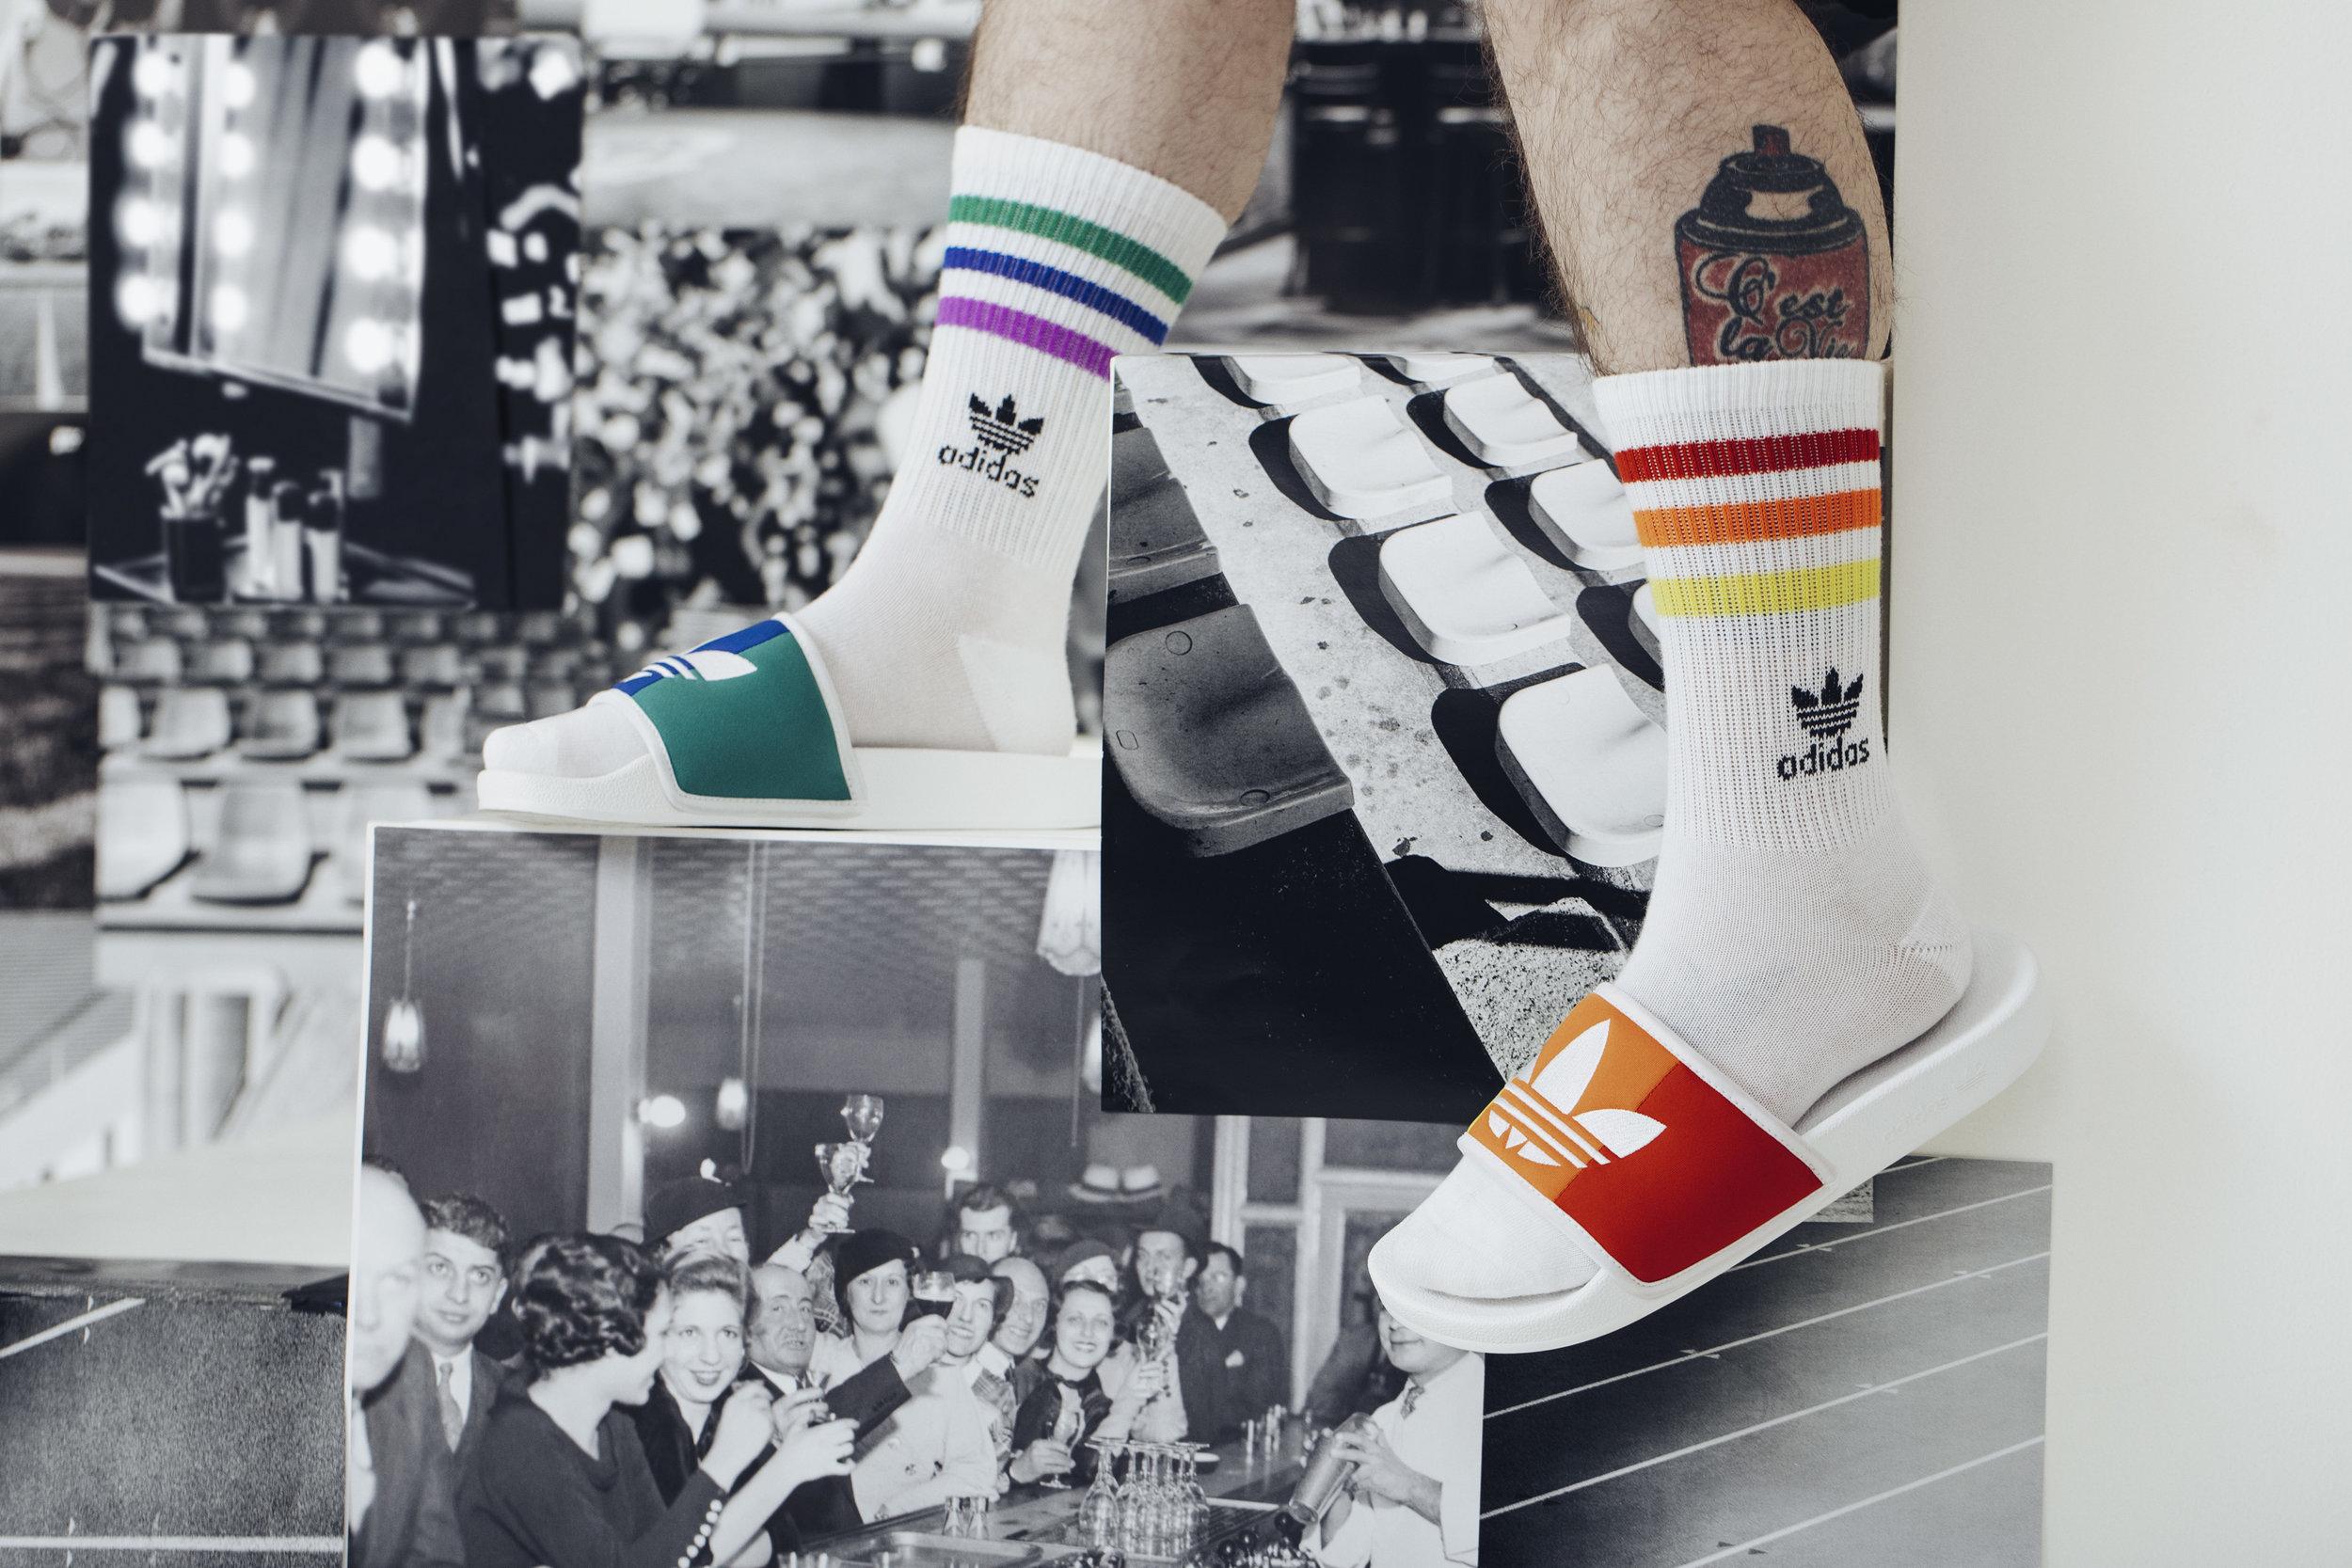 adidas_pride_love_unites_by_gia_goodrich_lesbian_artist_activist_Shot_07_Ace_Lk_1_00567.jpg